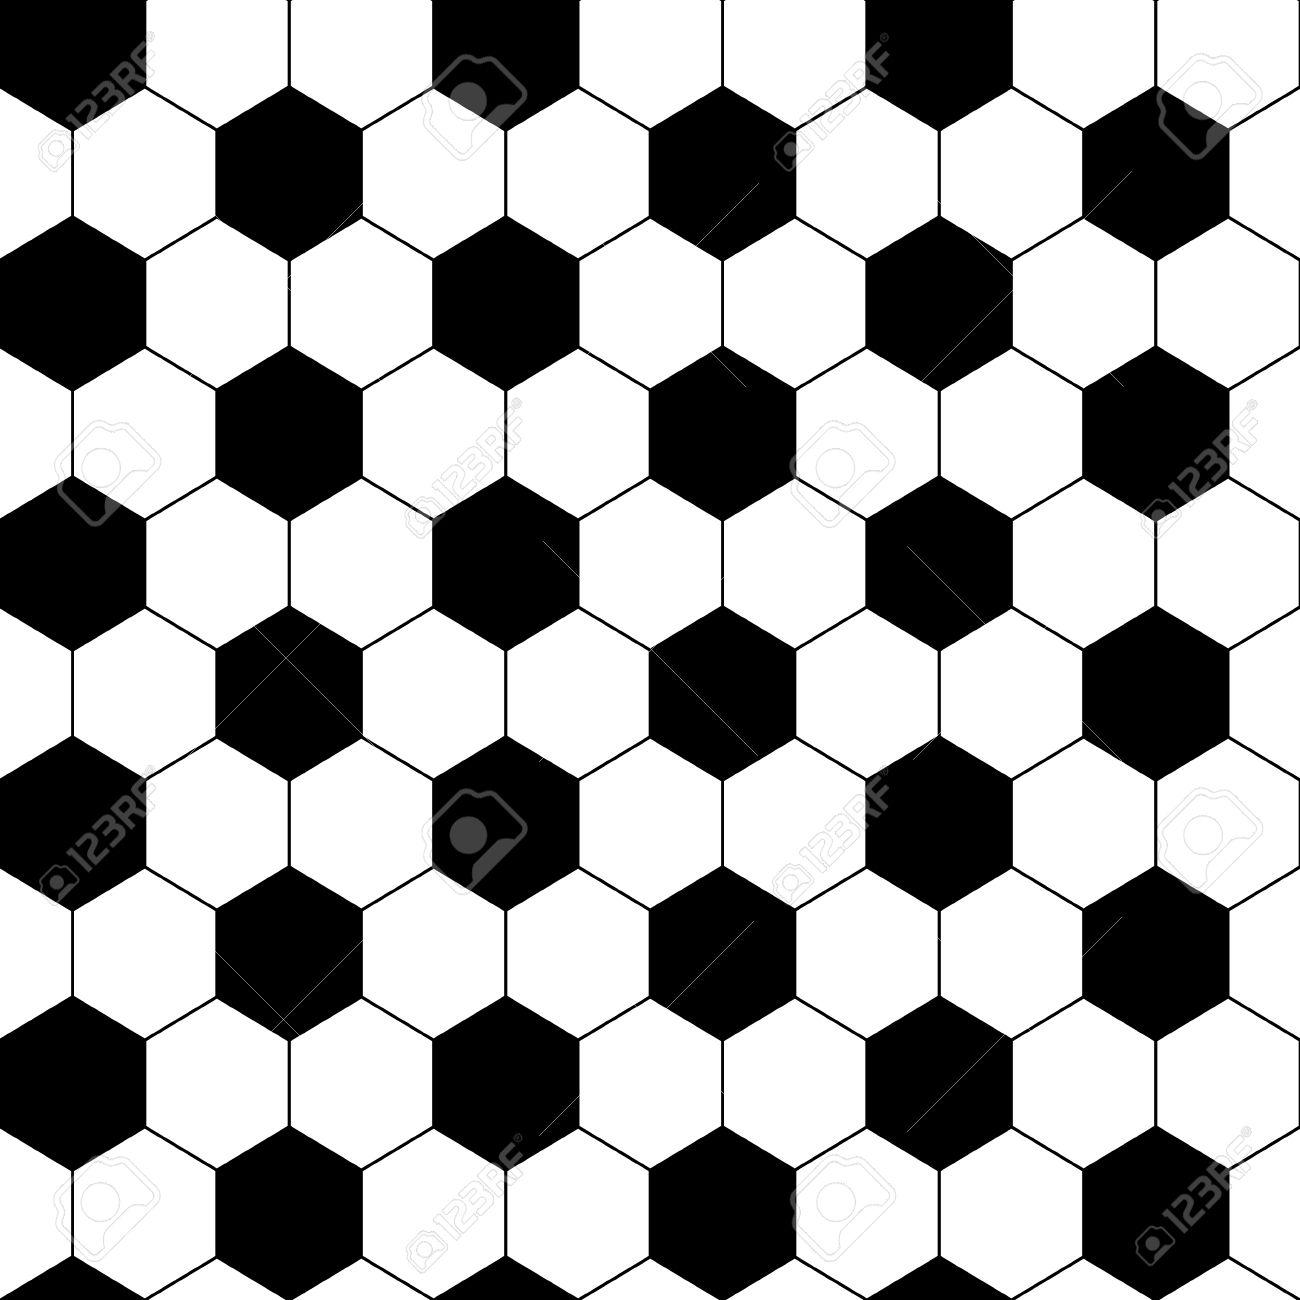 Black and white hexagon soccer ball seamless pattern, vector - 23832449